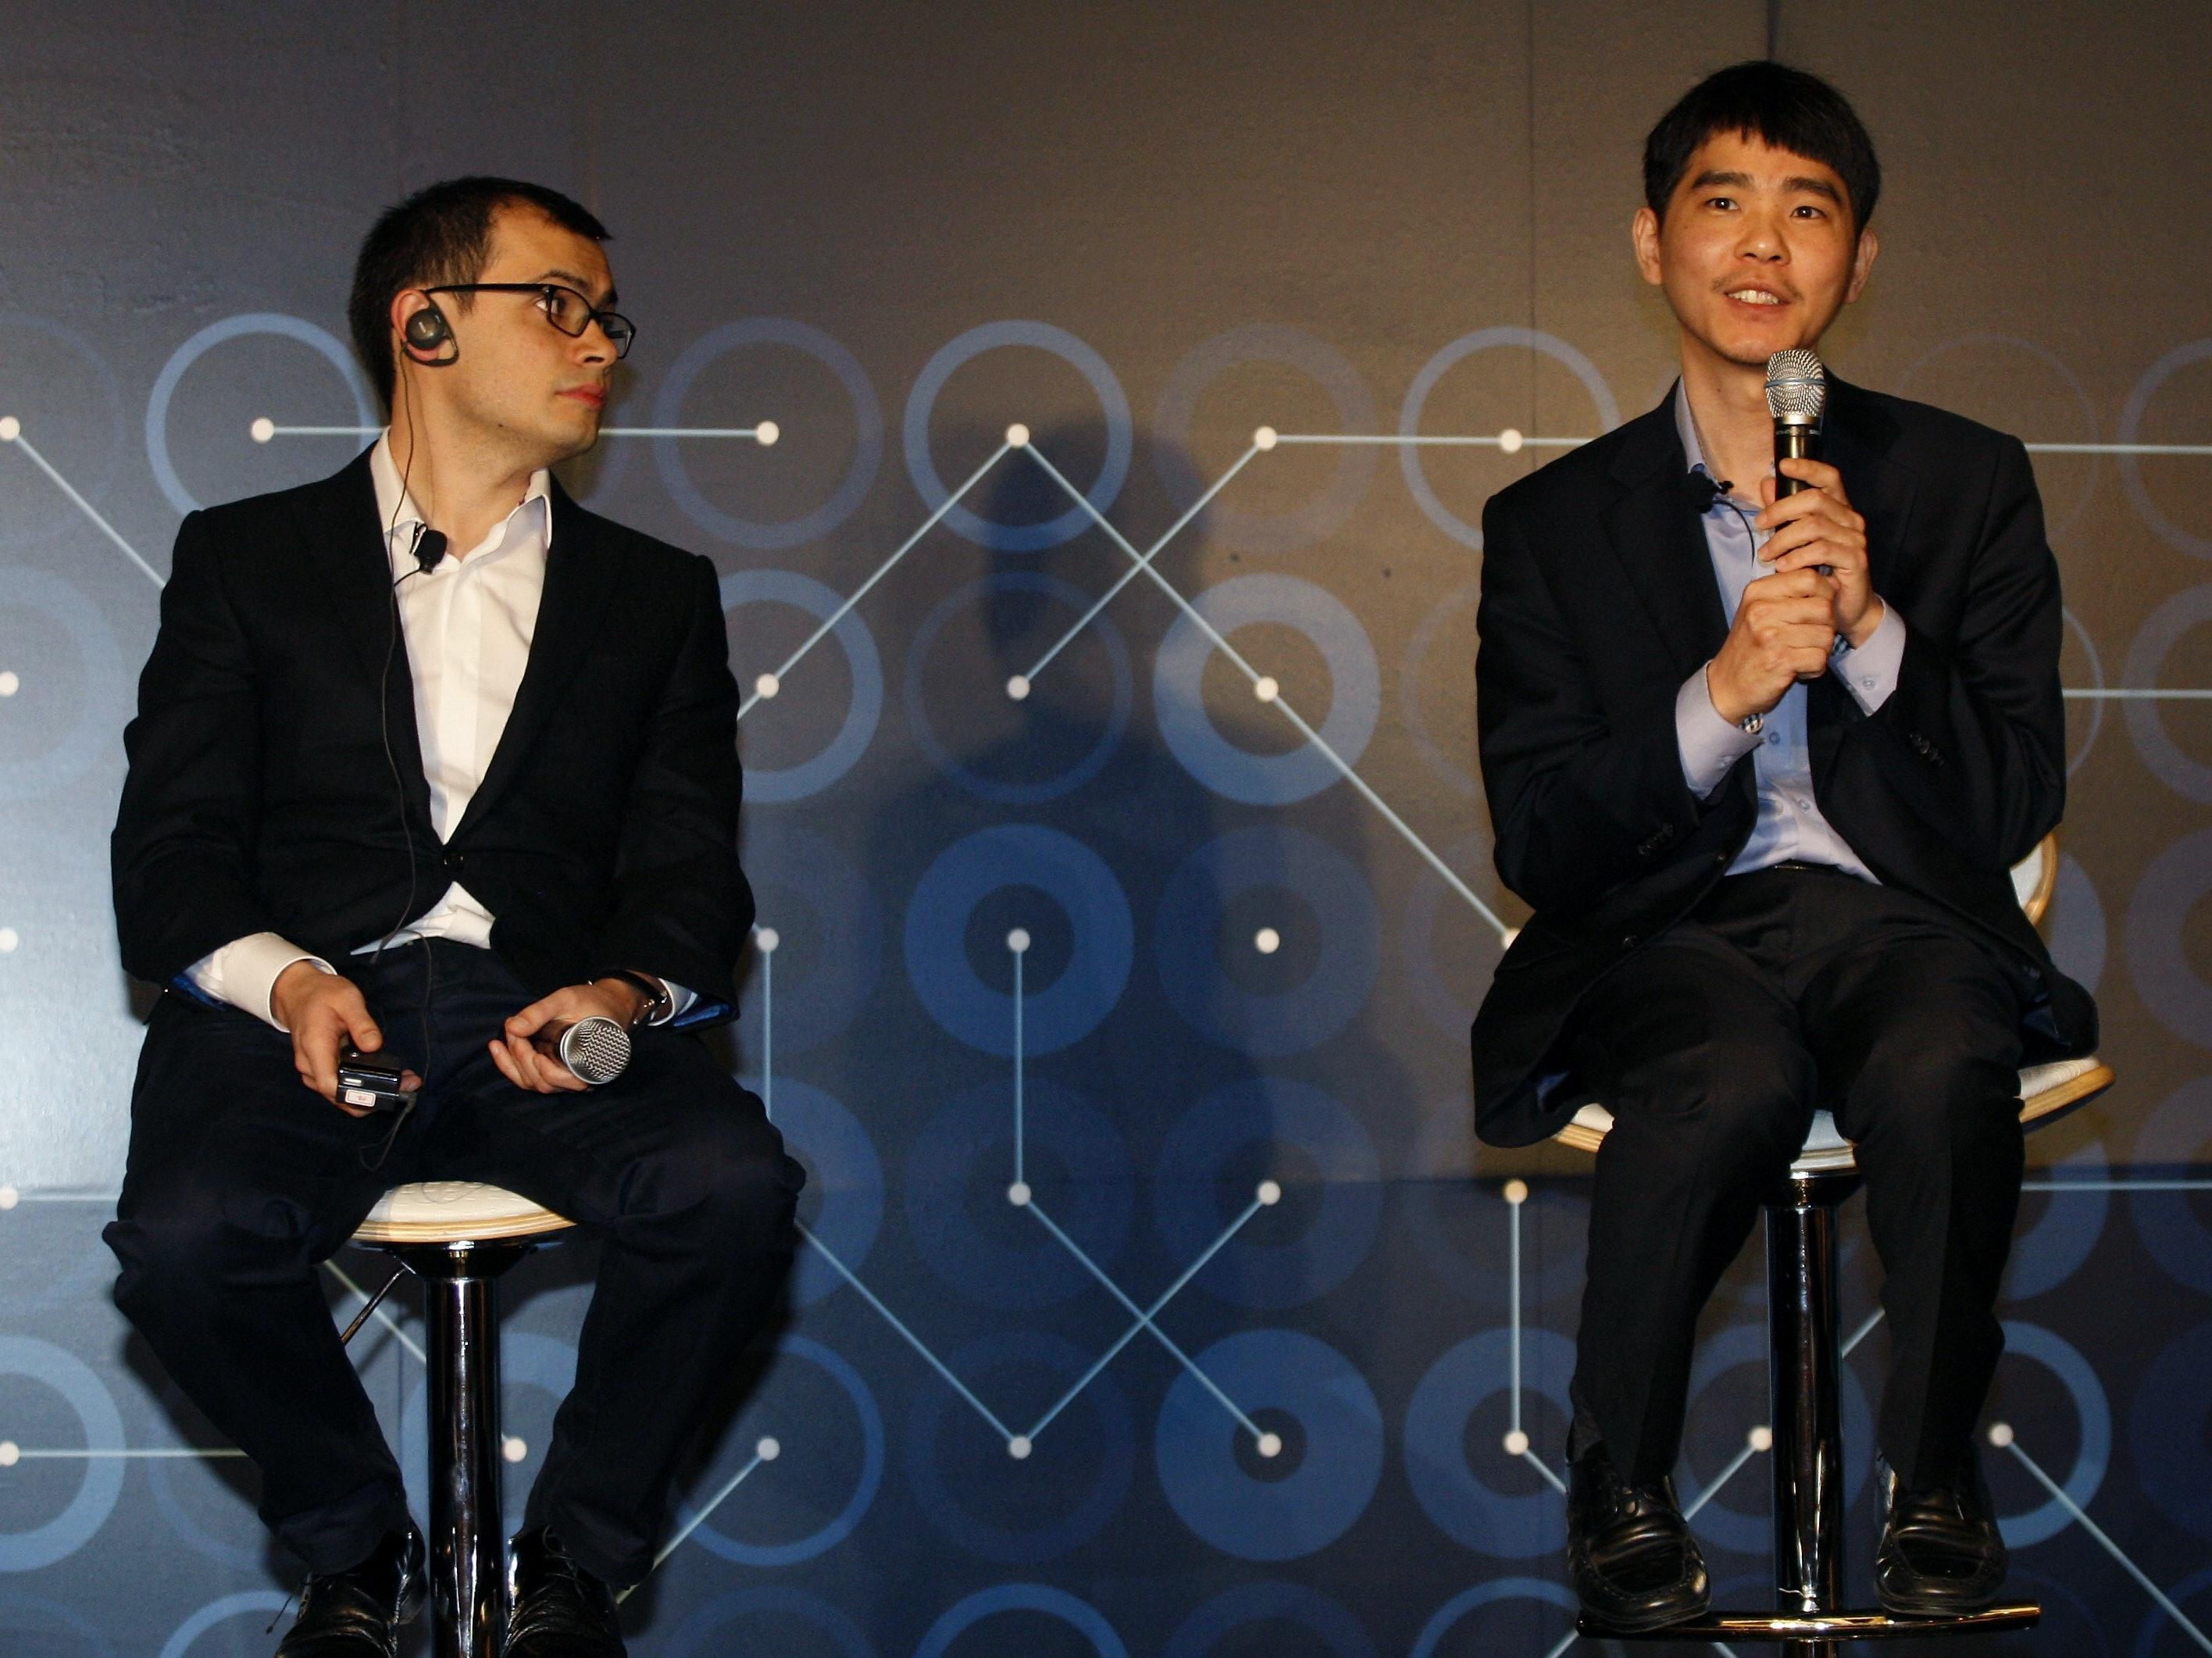 Lee Sedol Finishes Incredible Series Vs Google DeepMind's AlphaGo